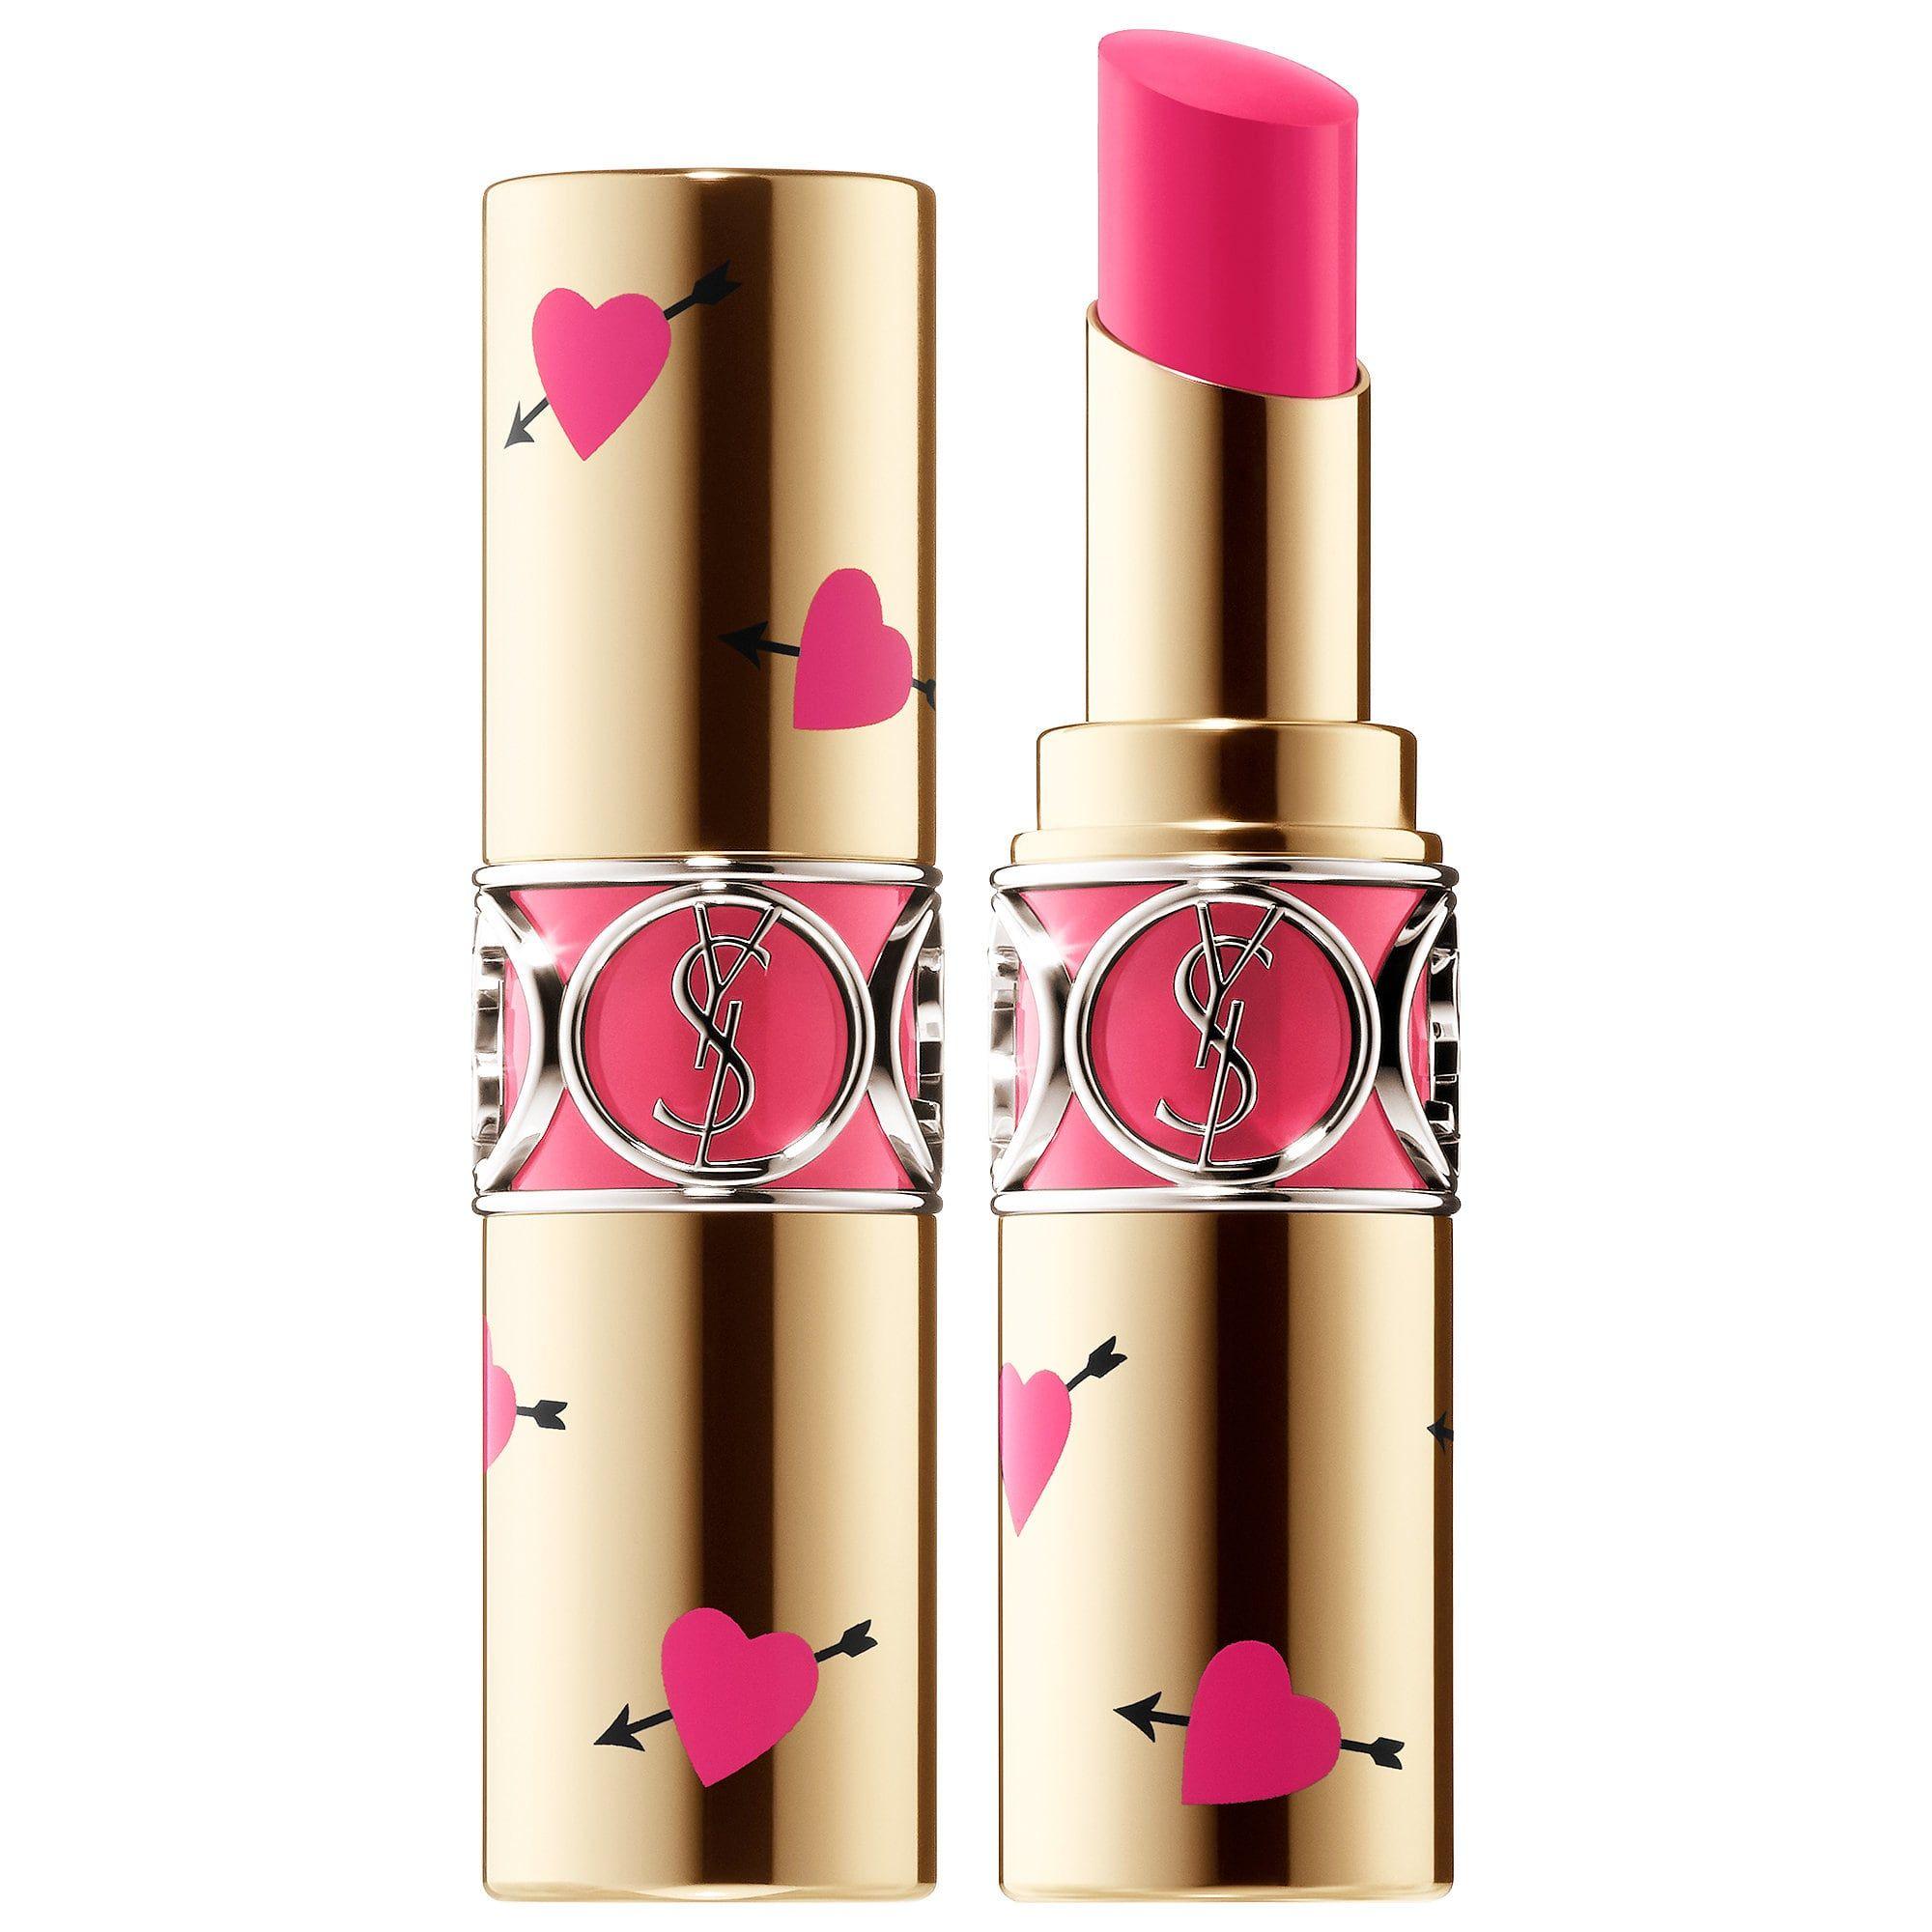 944a403b4f Yves Saint Laurent Heart   Arrow Collector Rouge Volupté Shine Lipstick 49  Rose Saint Germain 0.11 oz  3.2 g